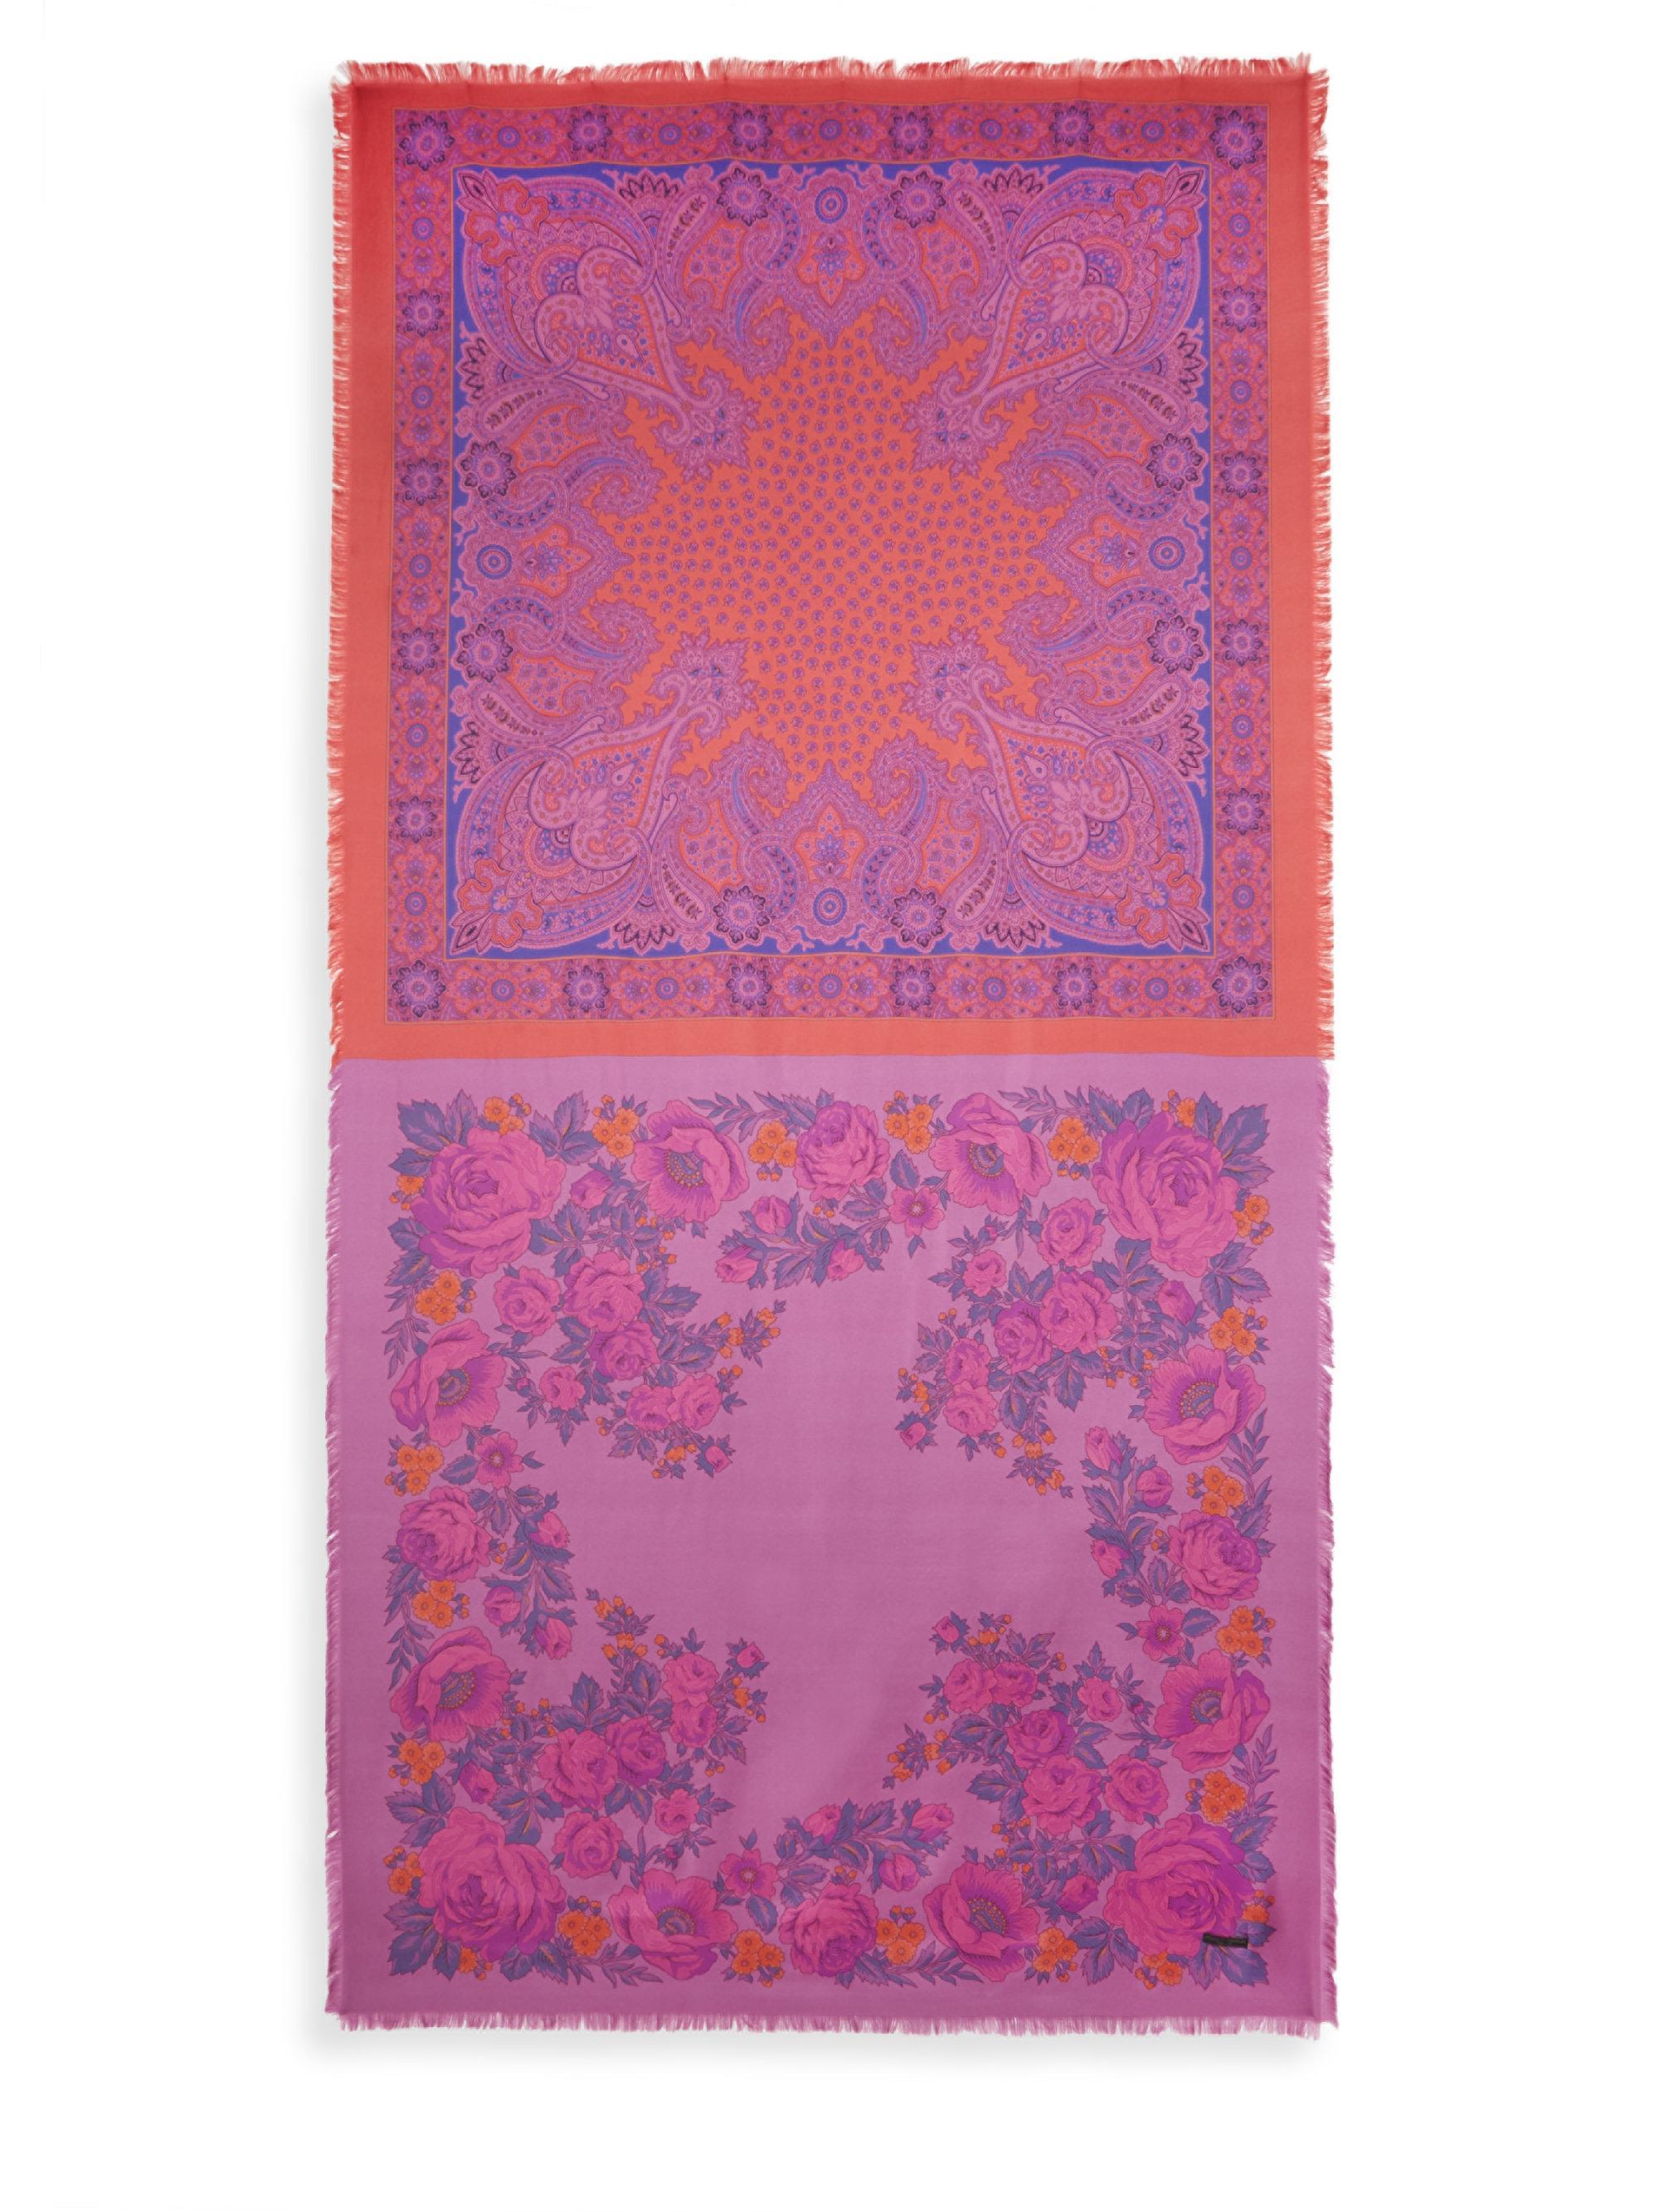 franco danao scarf surfboard silk multi lyst ferrari modal gallery accessories ivory